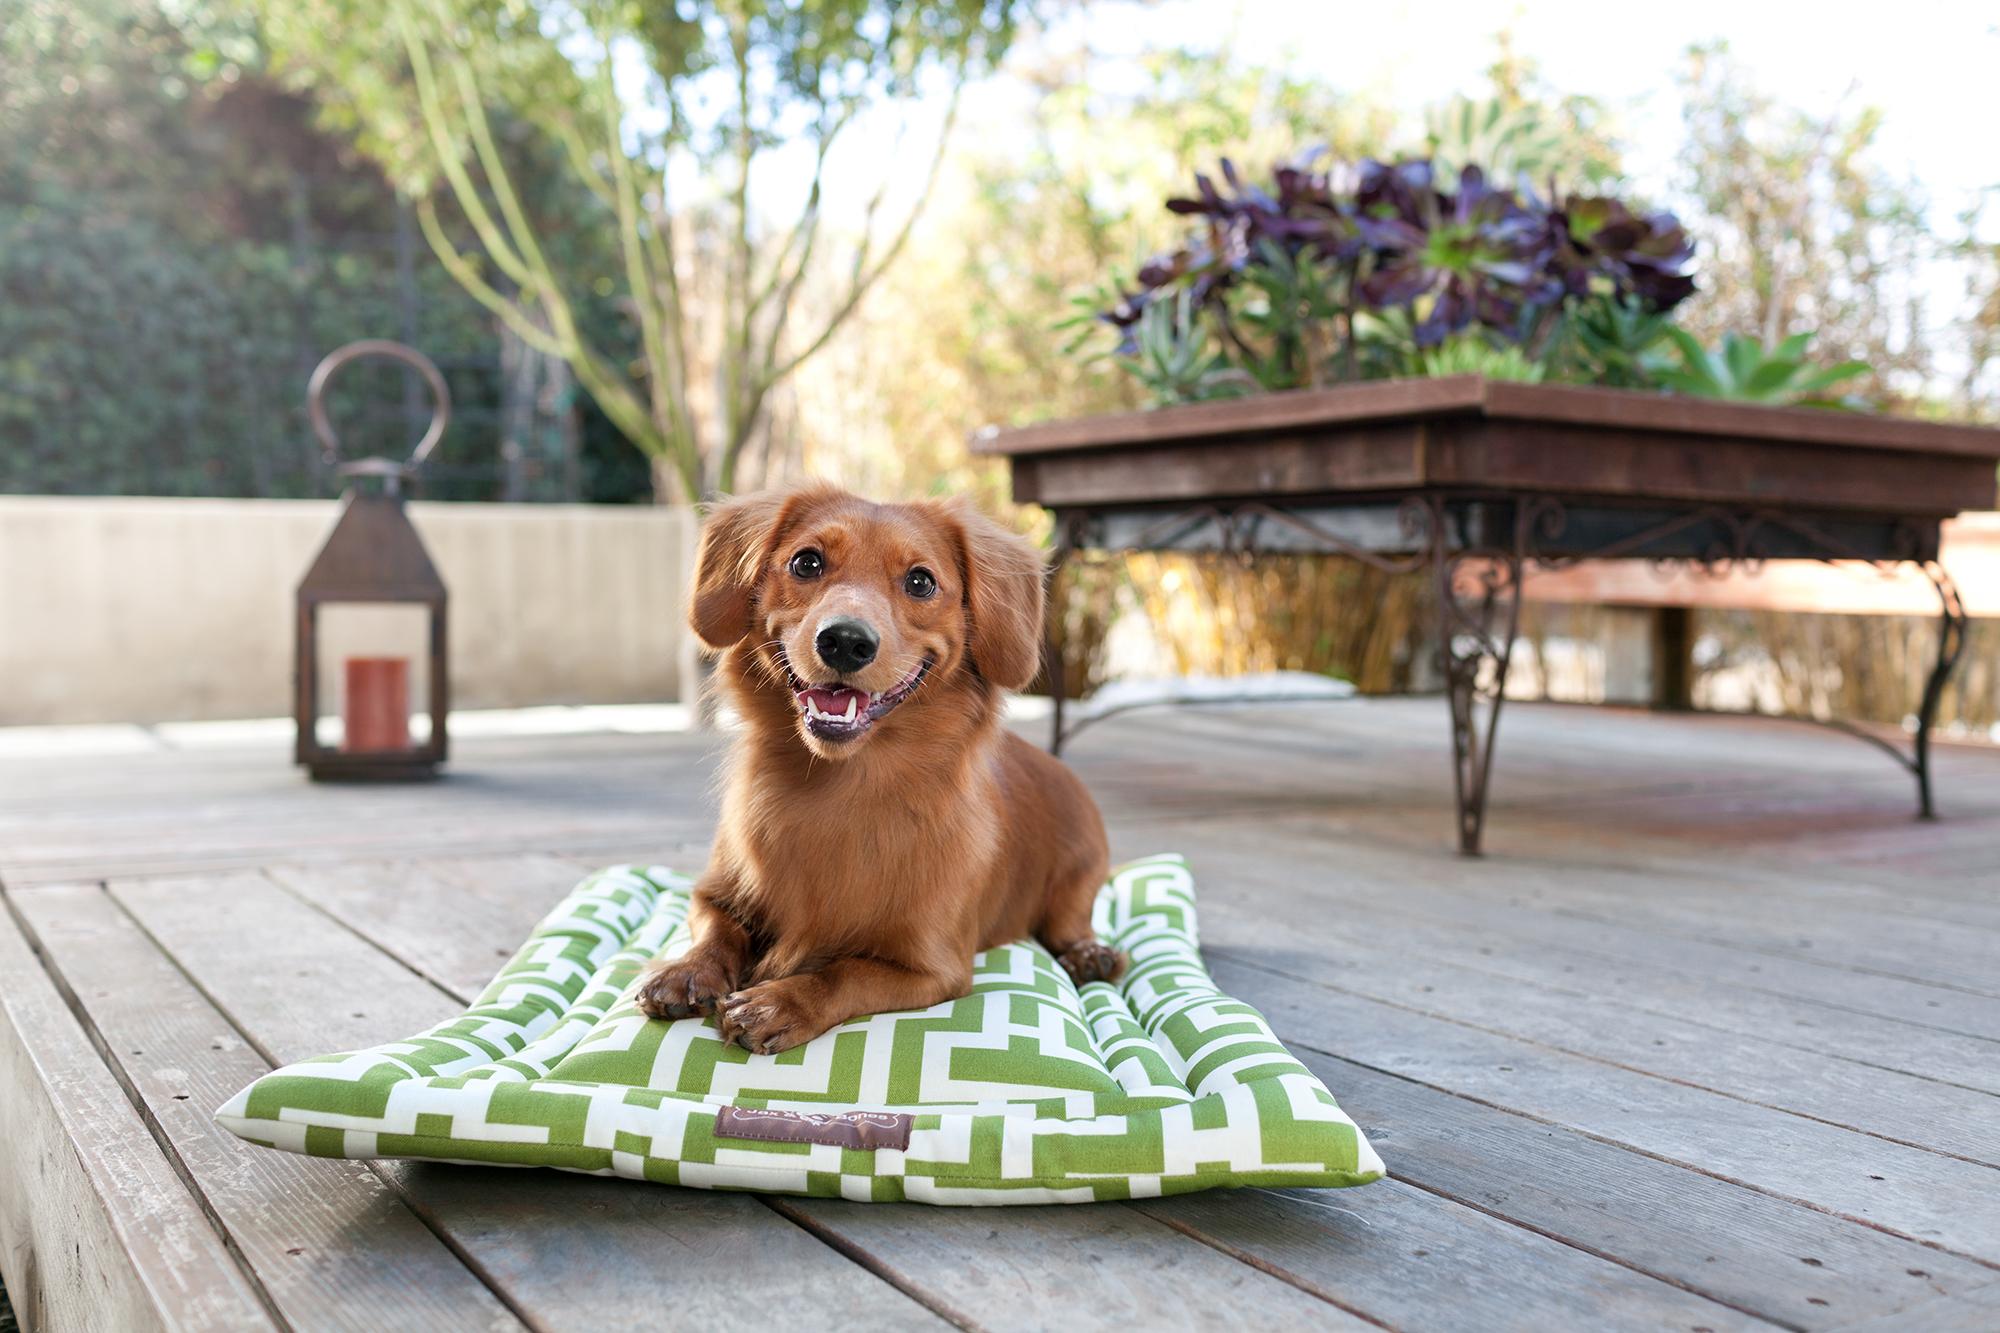 cozy-mat-occasional-outdoor-labryinth-lifestyle-2000x1333-72dpi-rgb.jpg